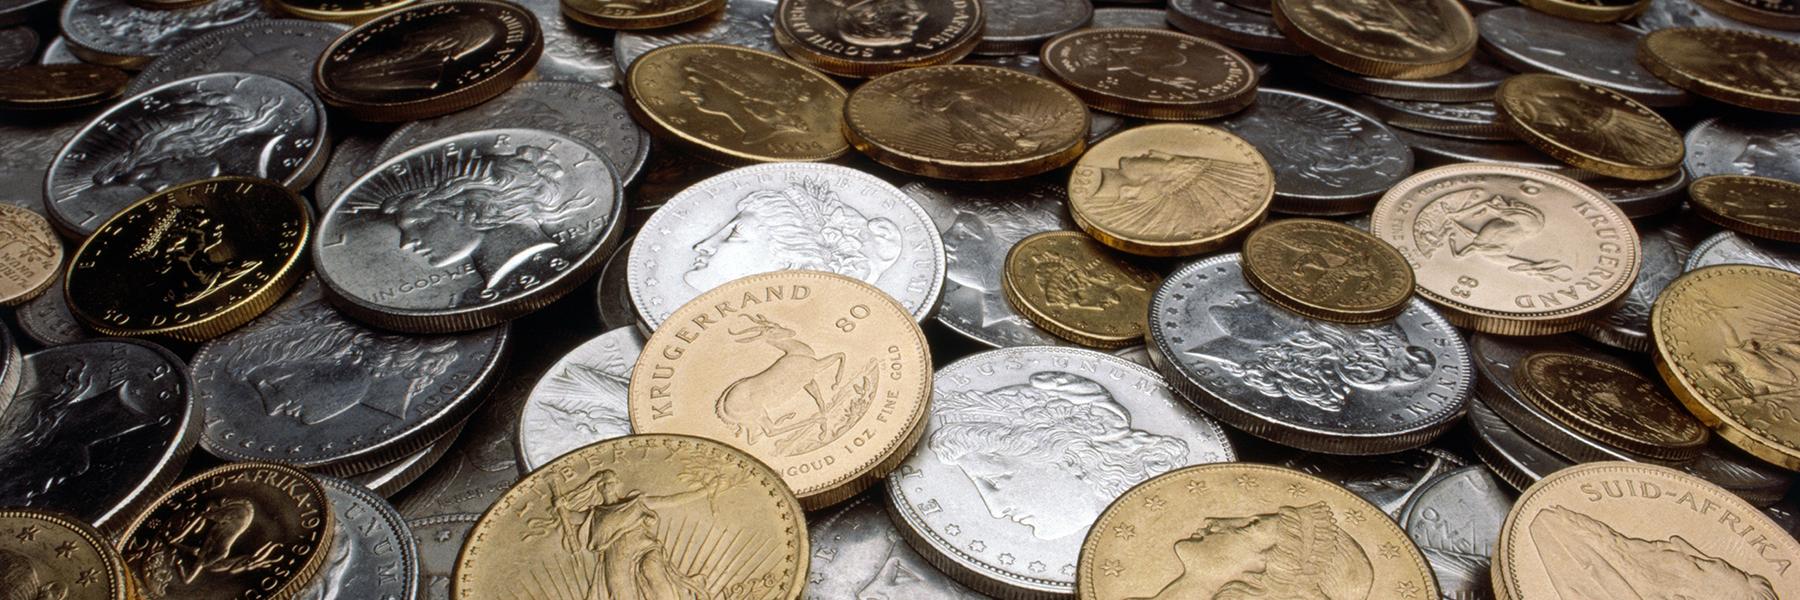 Kit's Rare Coins image 0